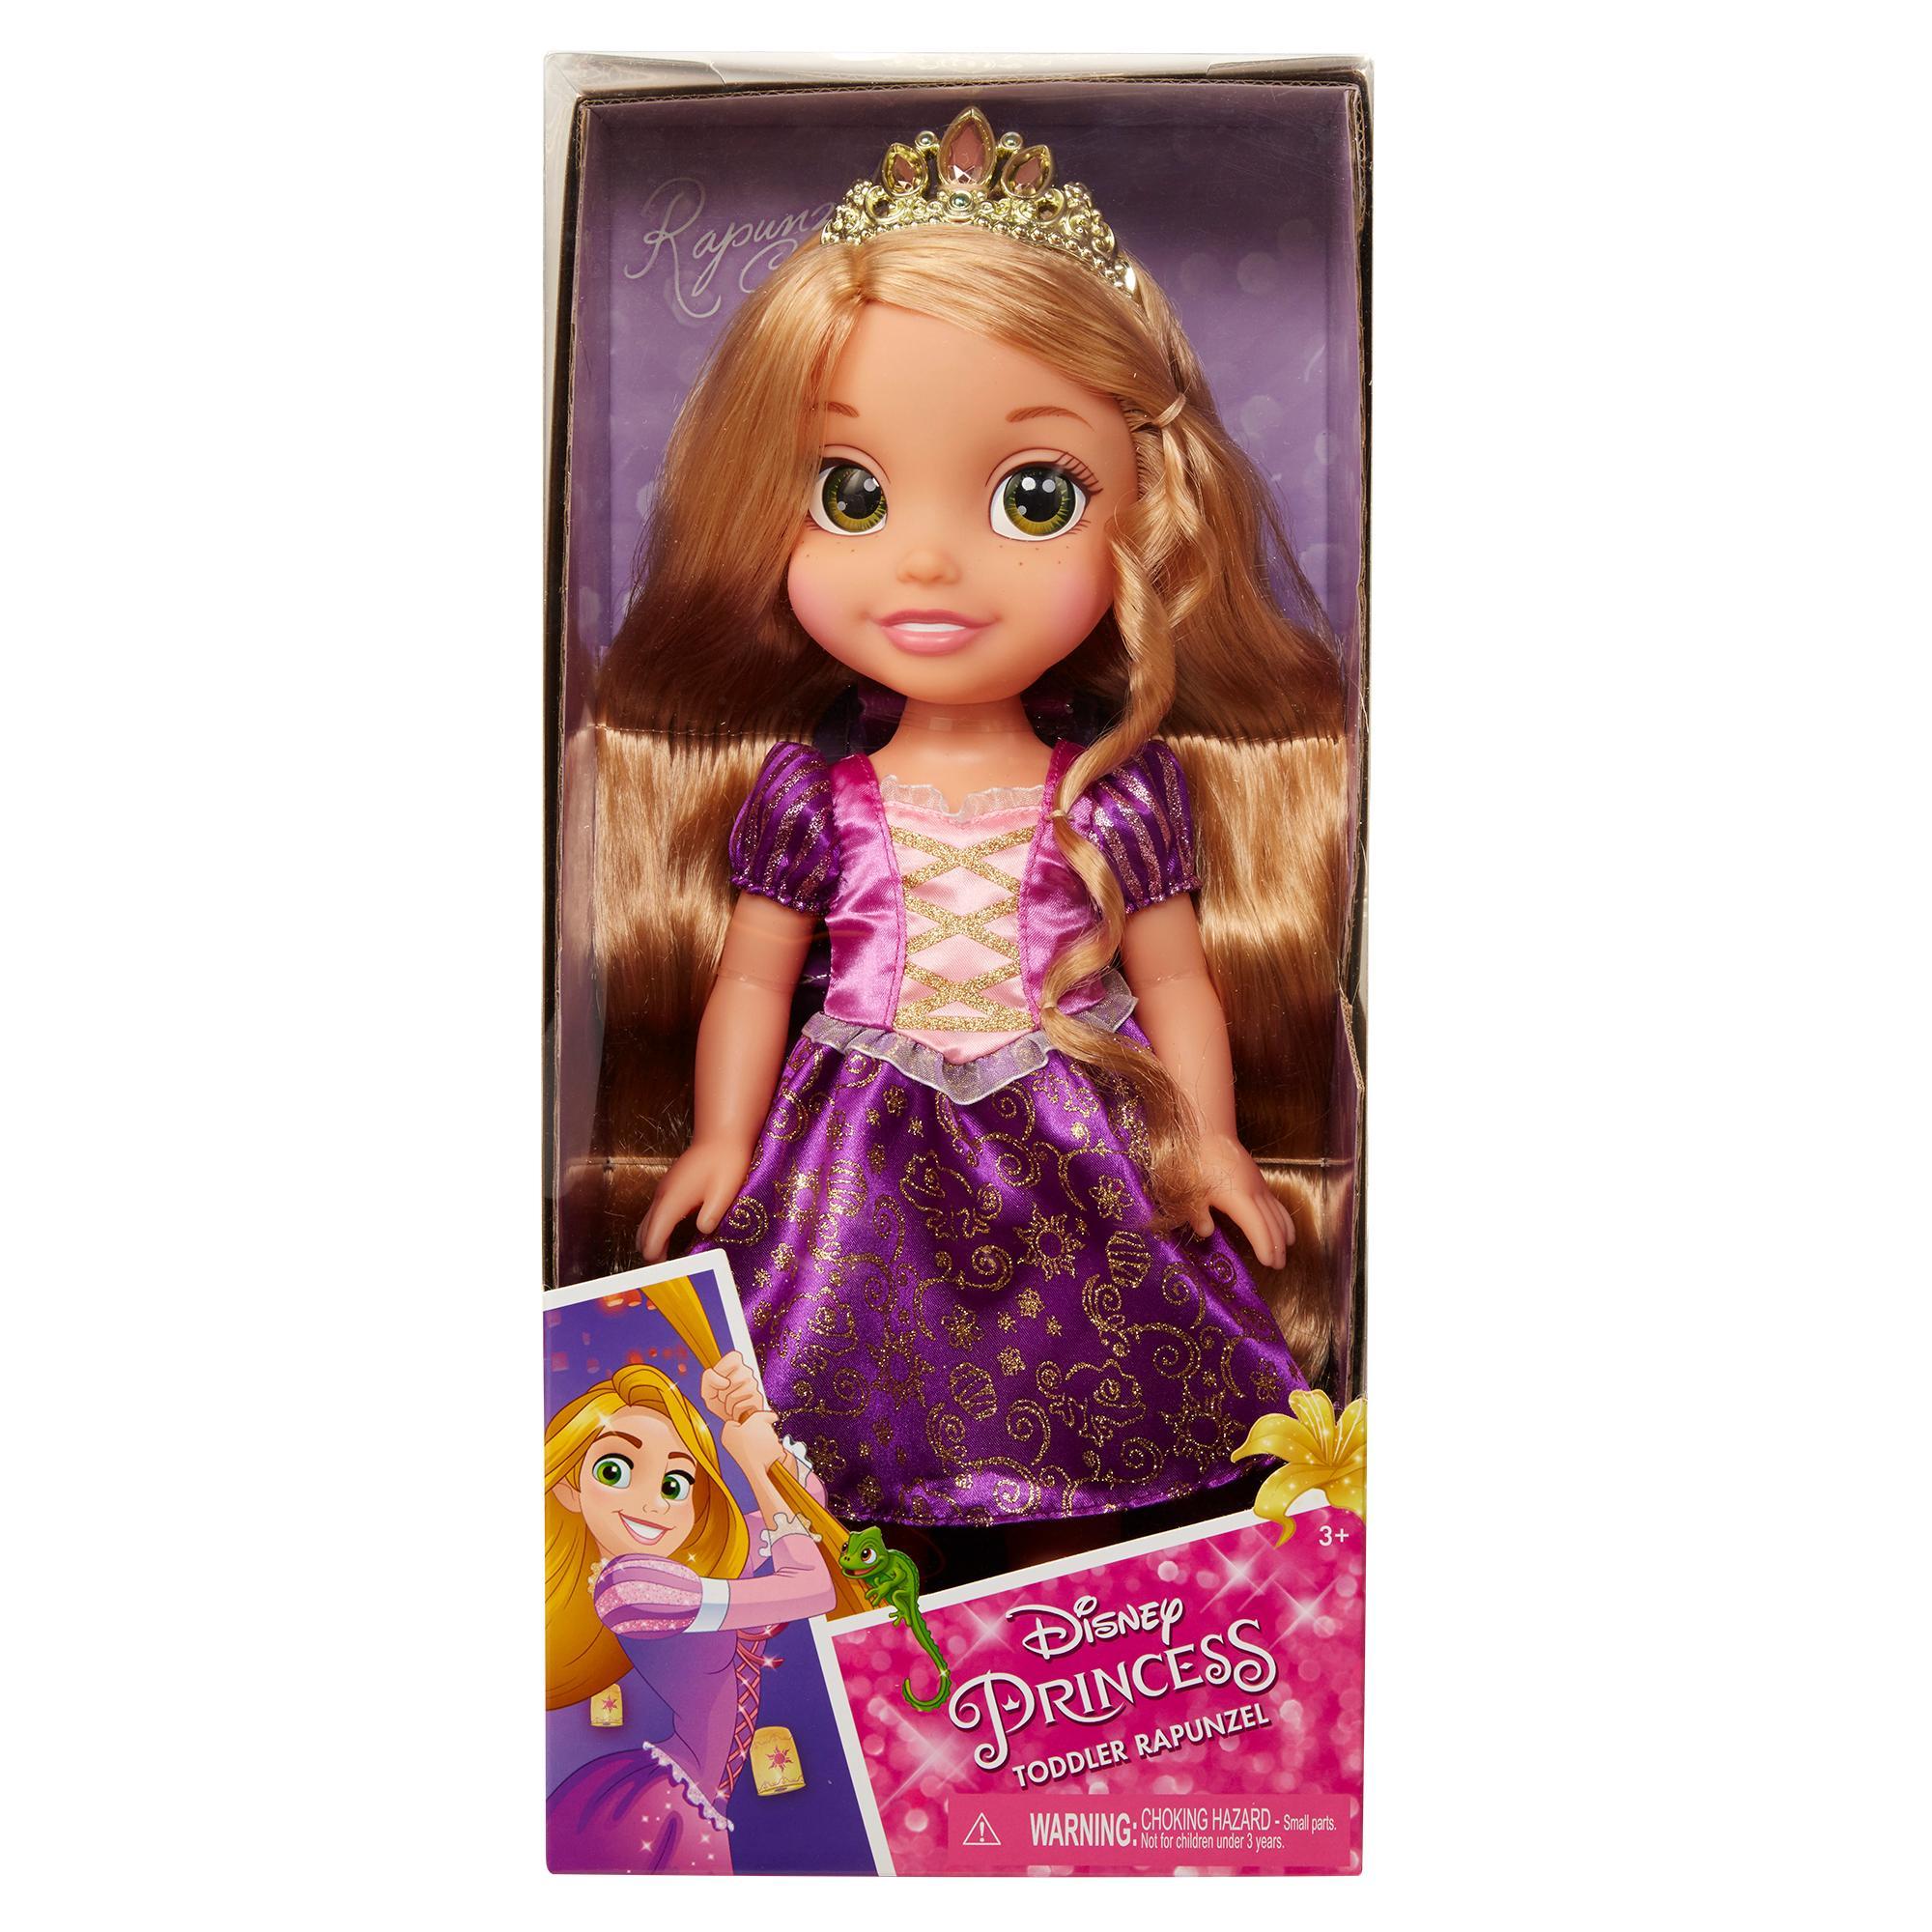 Amazon Com Disney Princess Baby Belle Doll Toys Games: Amazon.com: Disney Princess Aurora Toddler Doll: Toys & Games